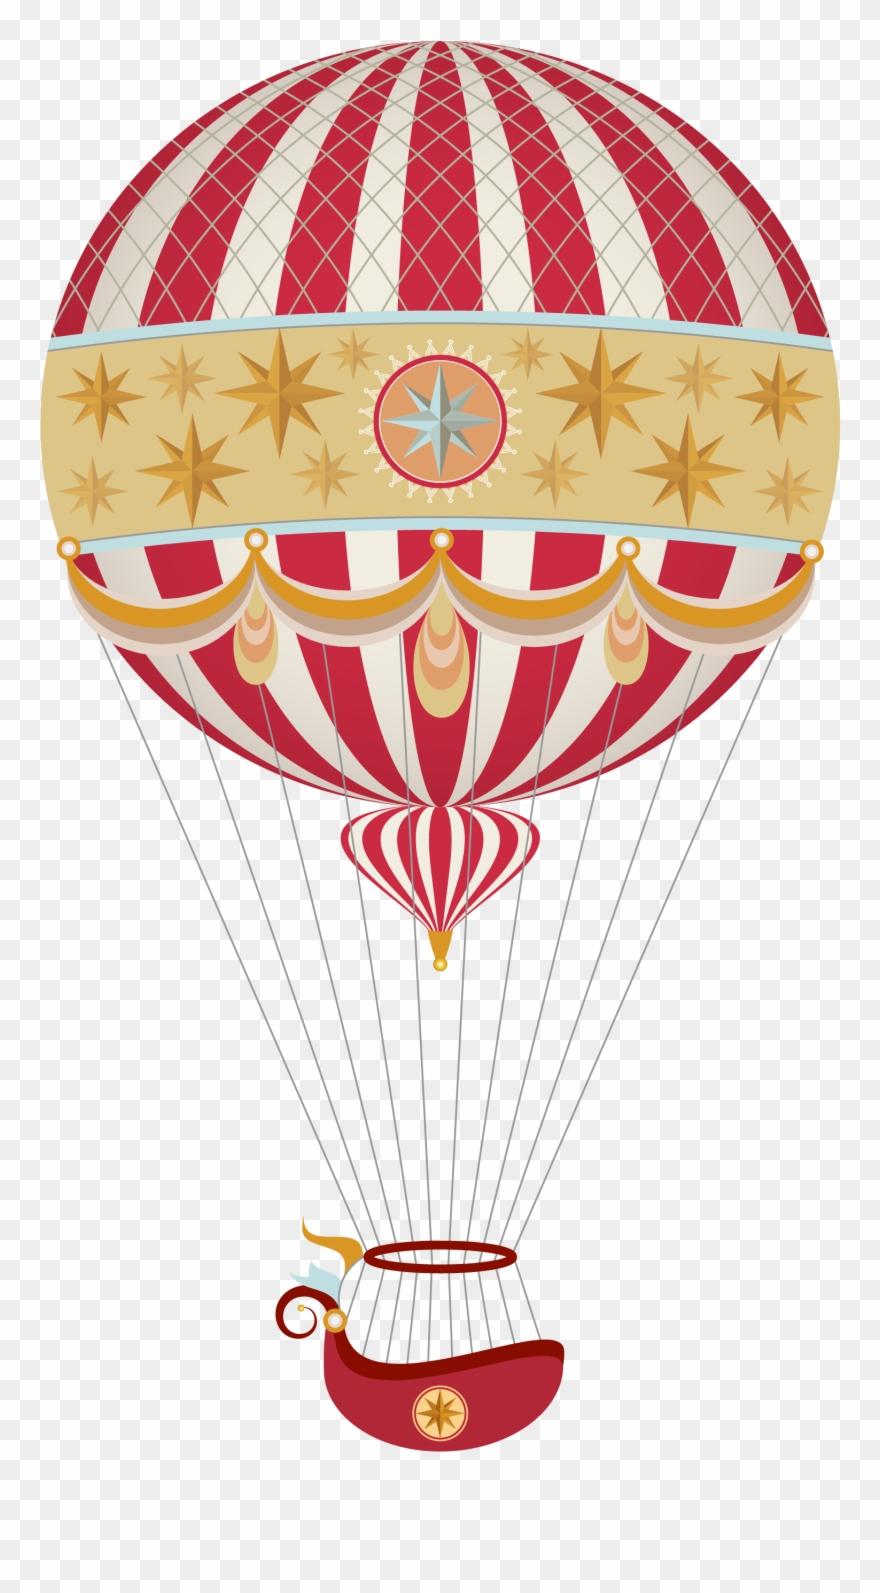 Clipart balloons vintage. Clip art png download